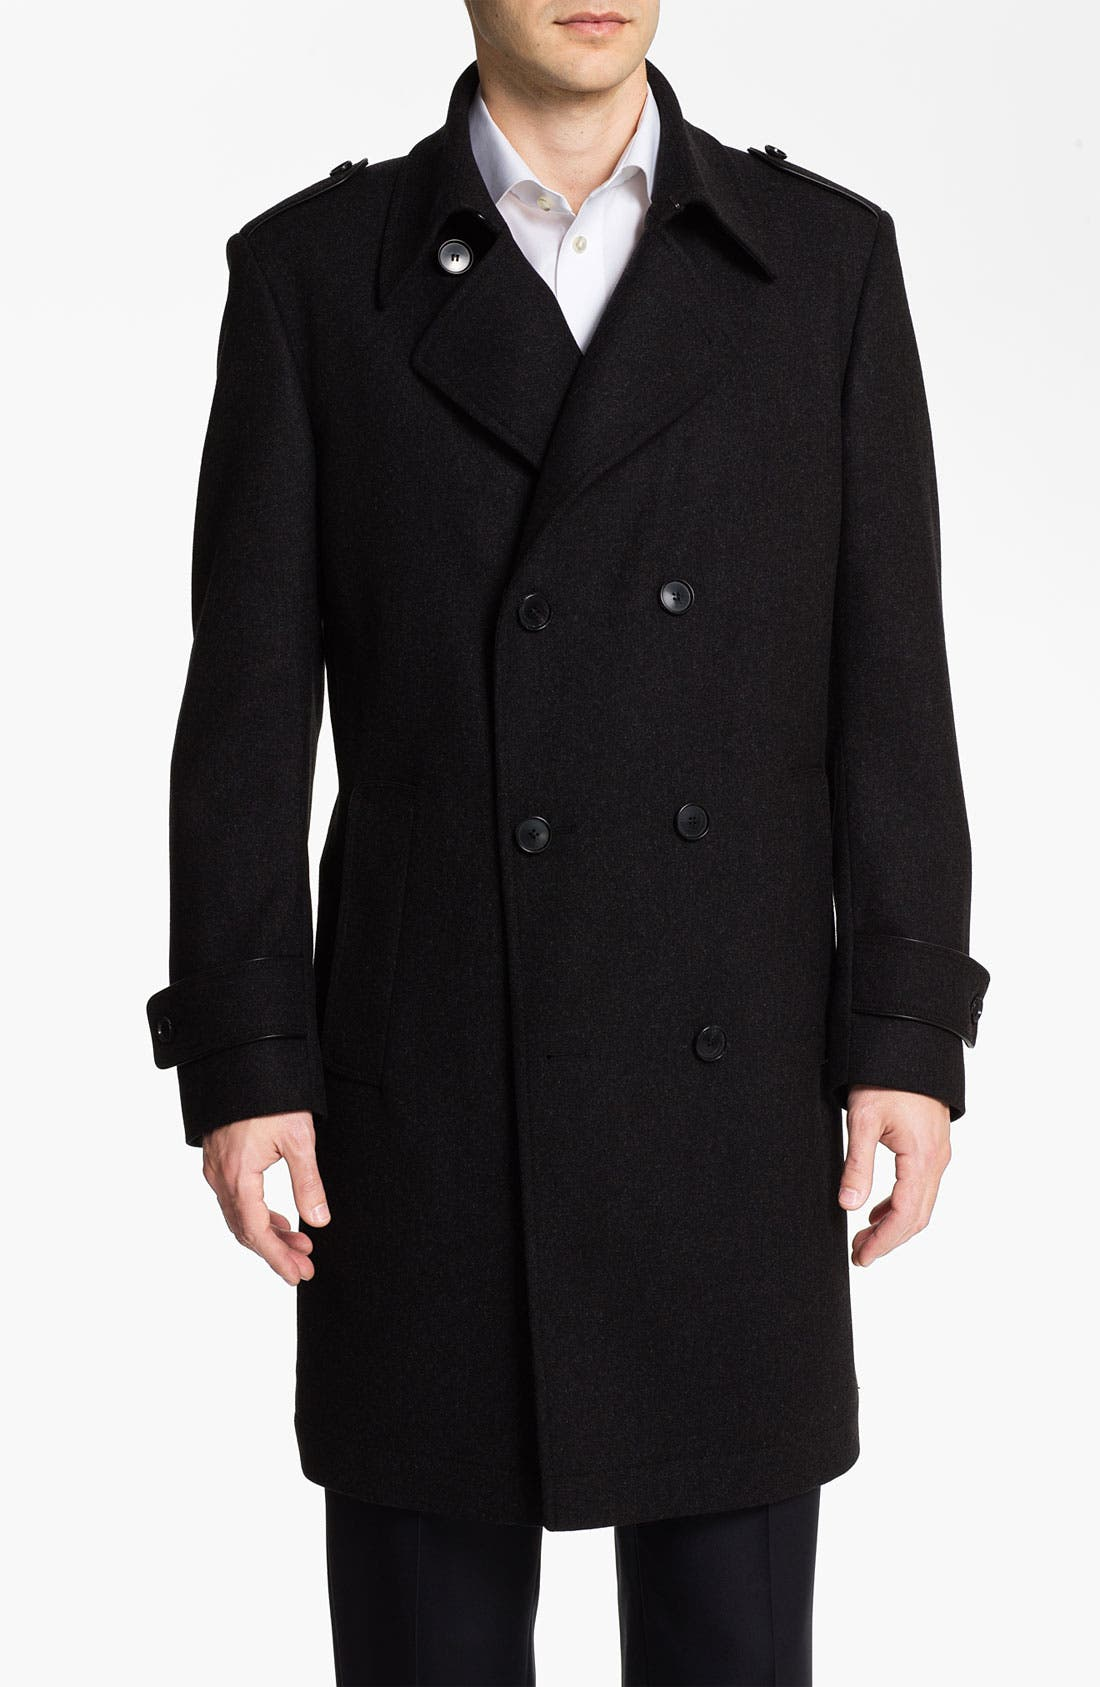 Alternate Image 1 Selected - BOSS Black 'Husk' Double Breasted Topcoat